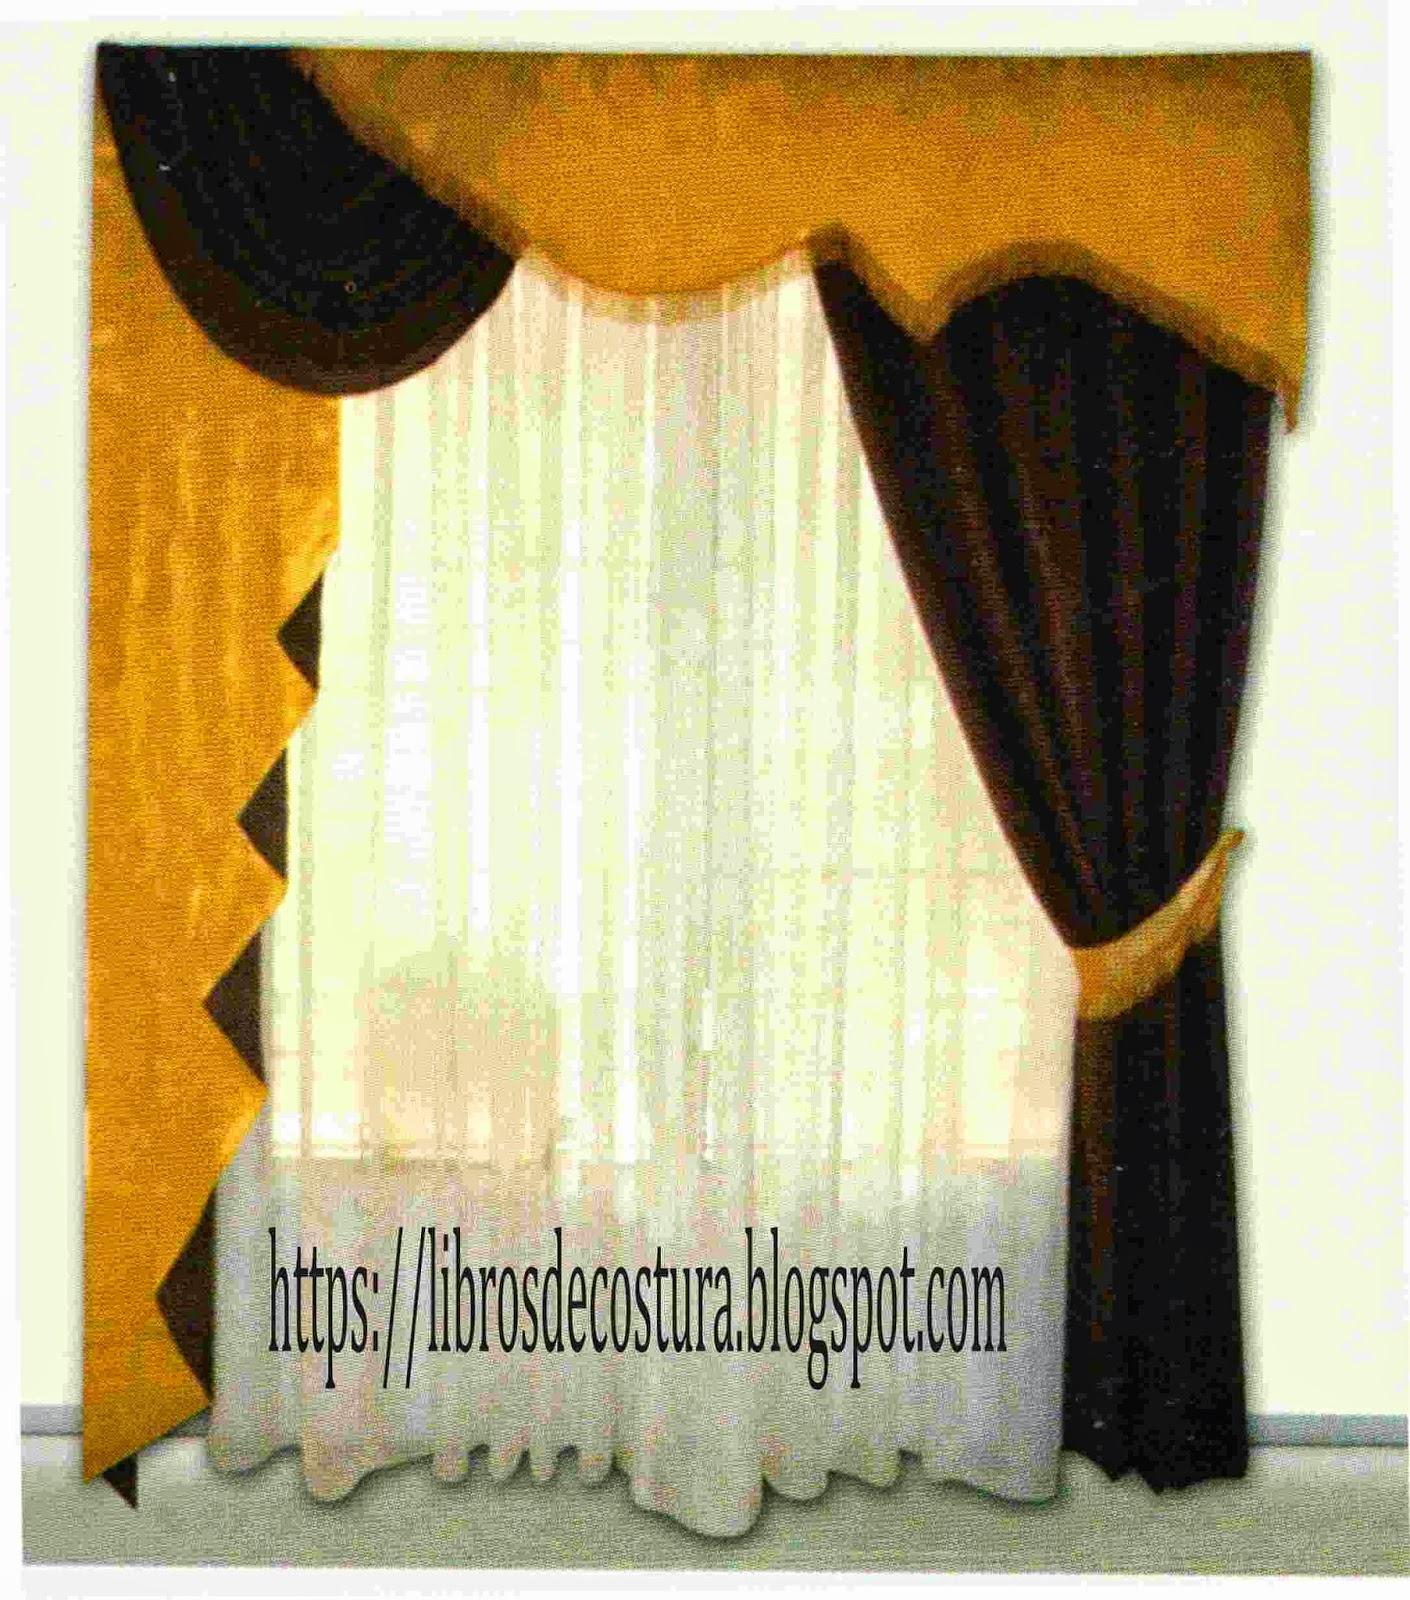 Libros de costura como hacer cortinas paso a paso for Modelos de cortinas para cuartos